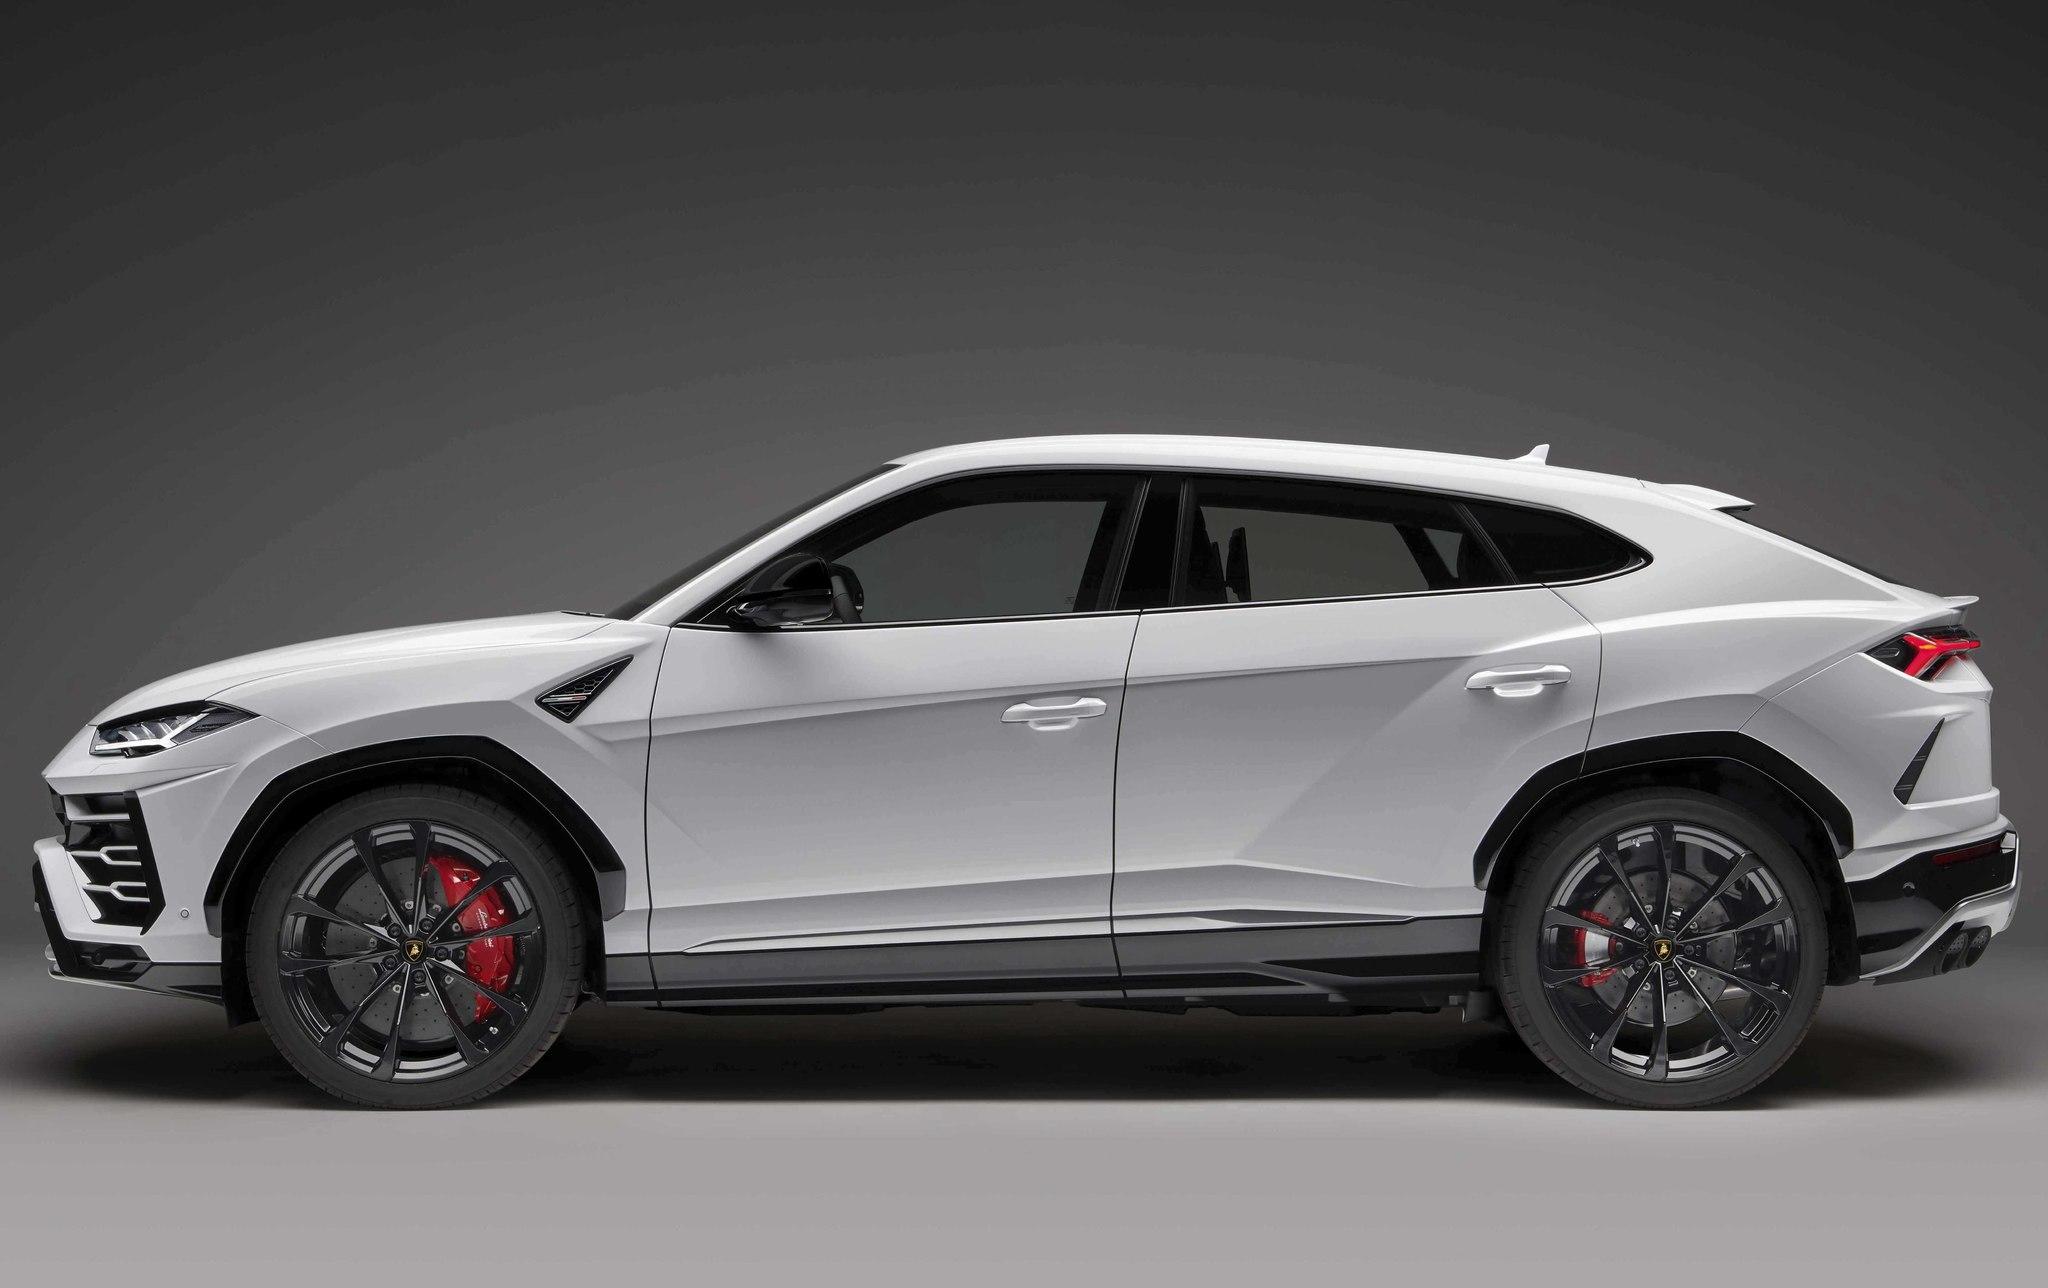 Cómo se venden marcas como Aston Martin y Lamborghini en México